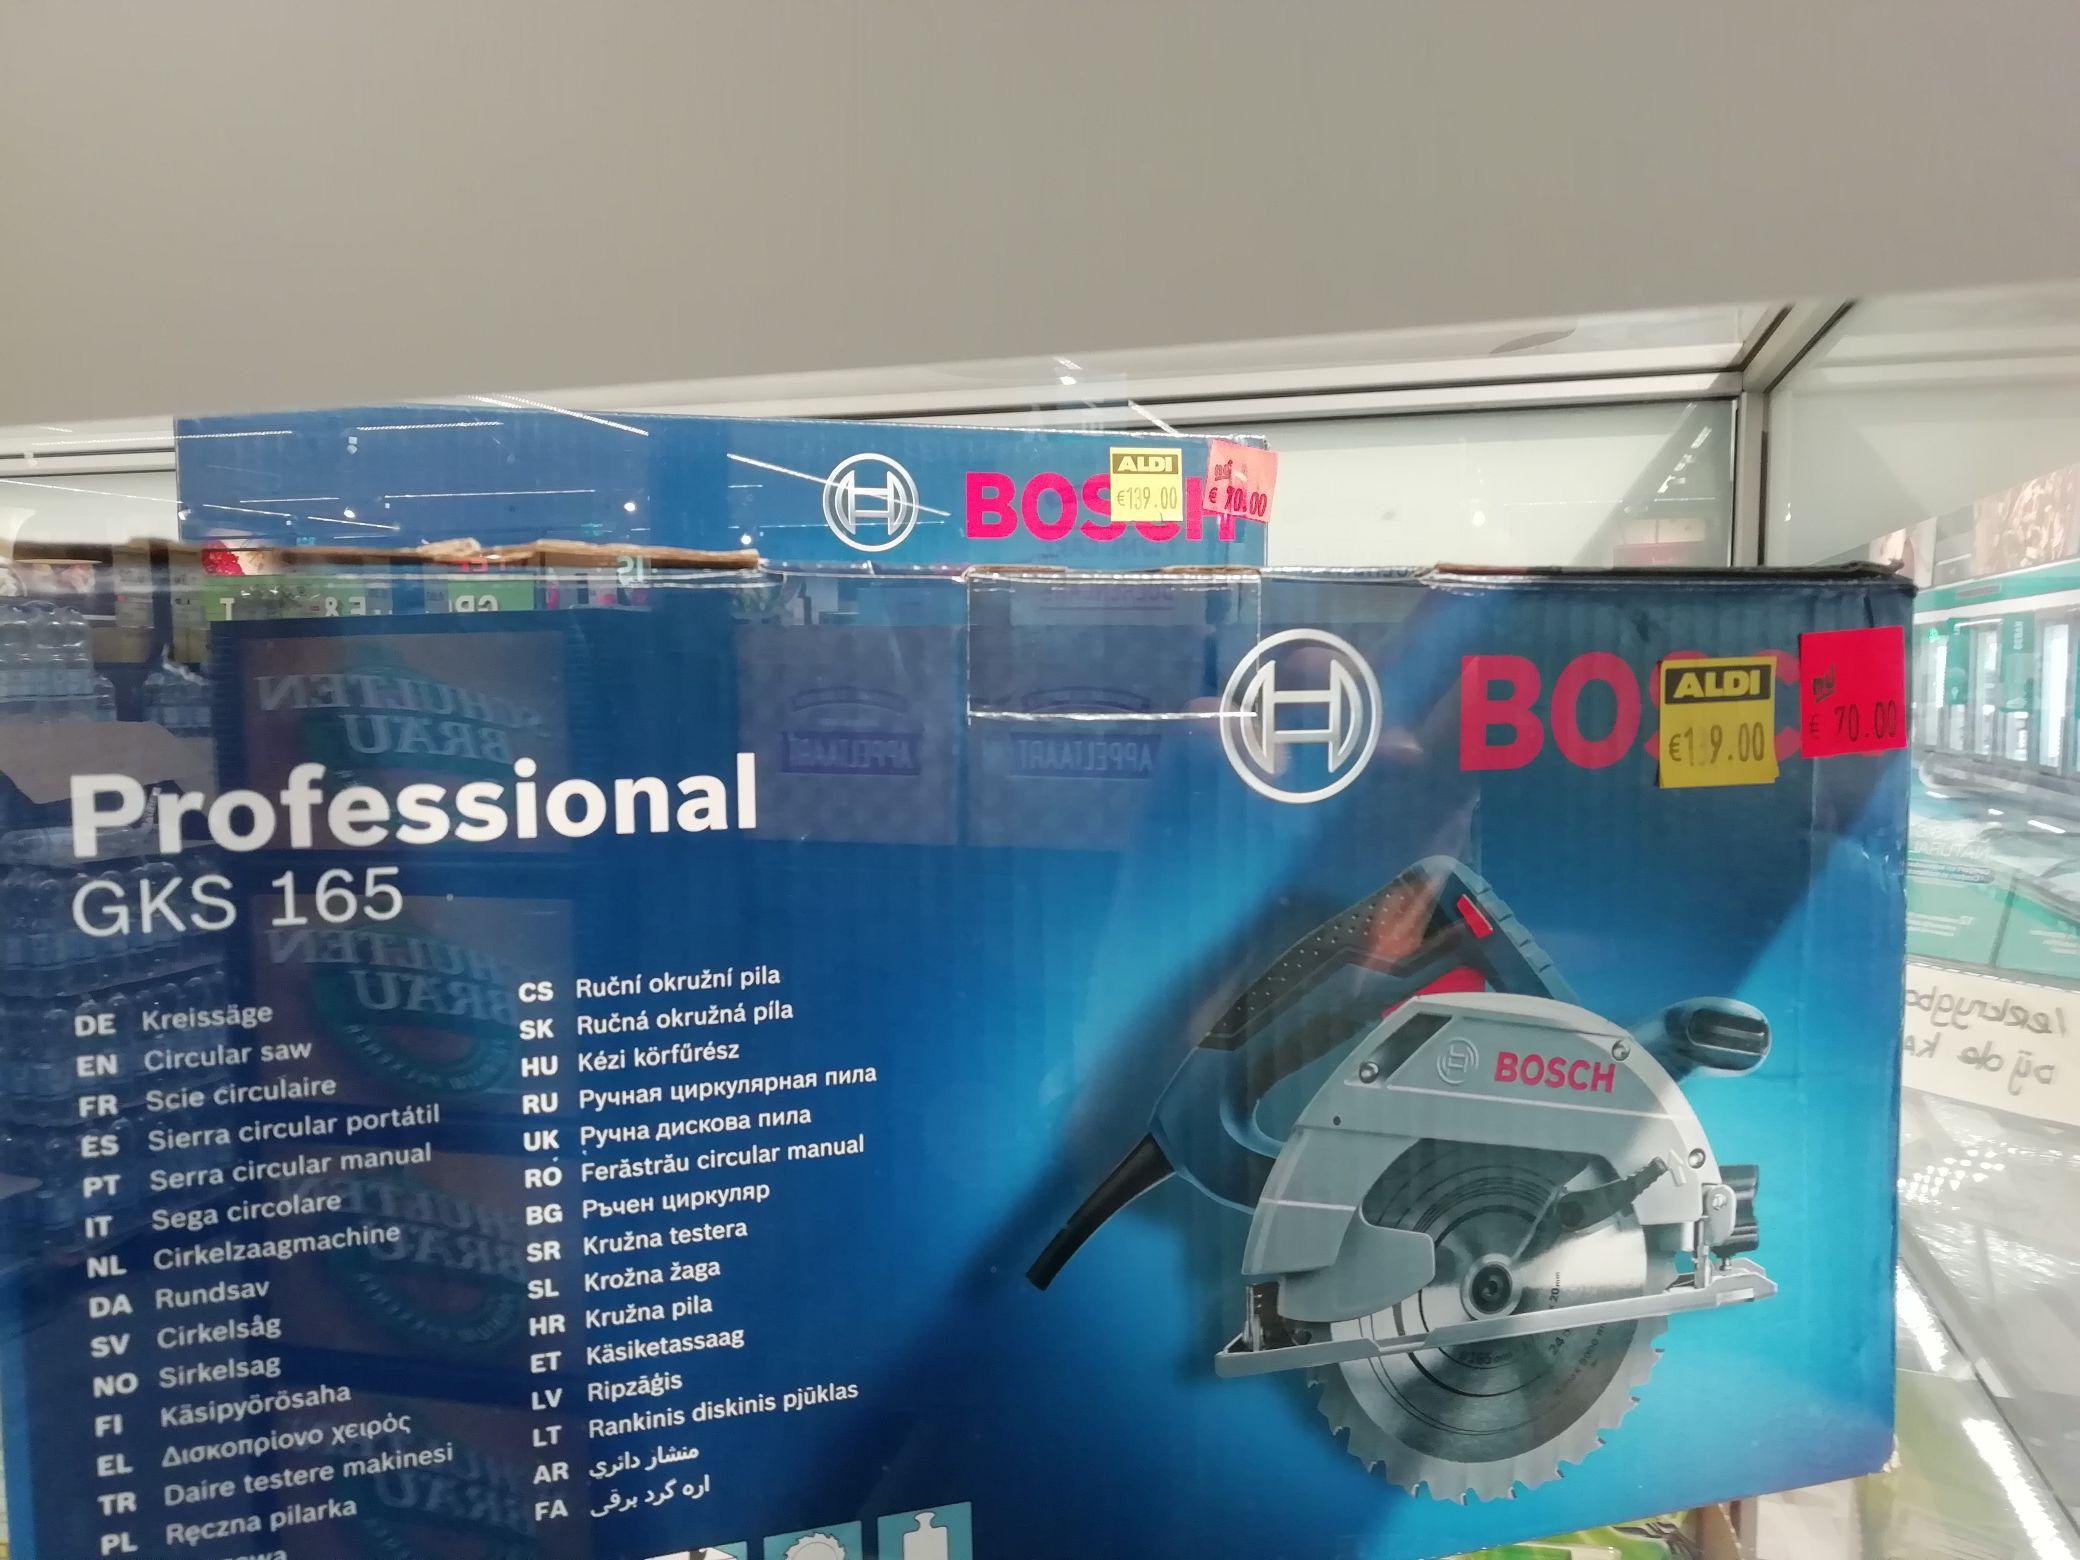 Bosch GKS 165 circelzaag 70 euro @ Aldi